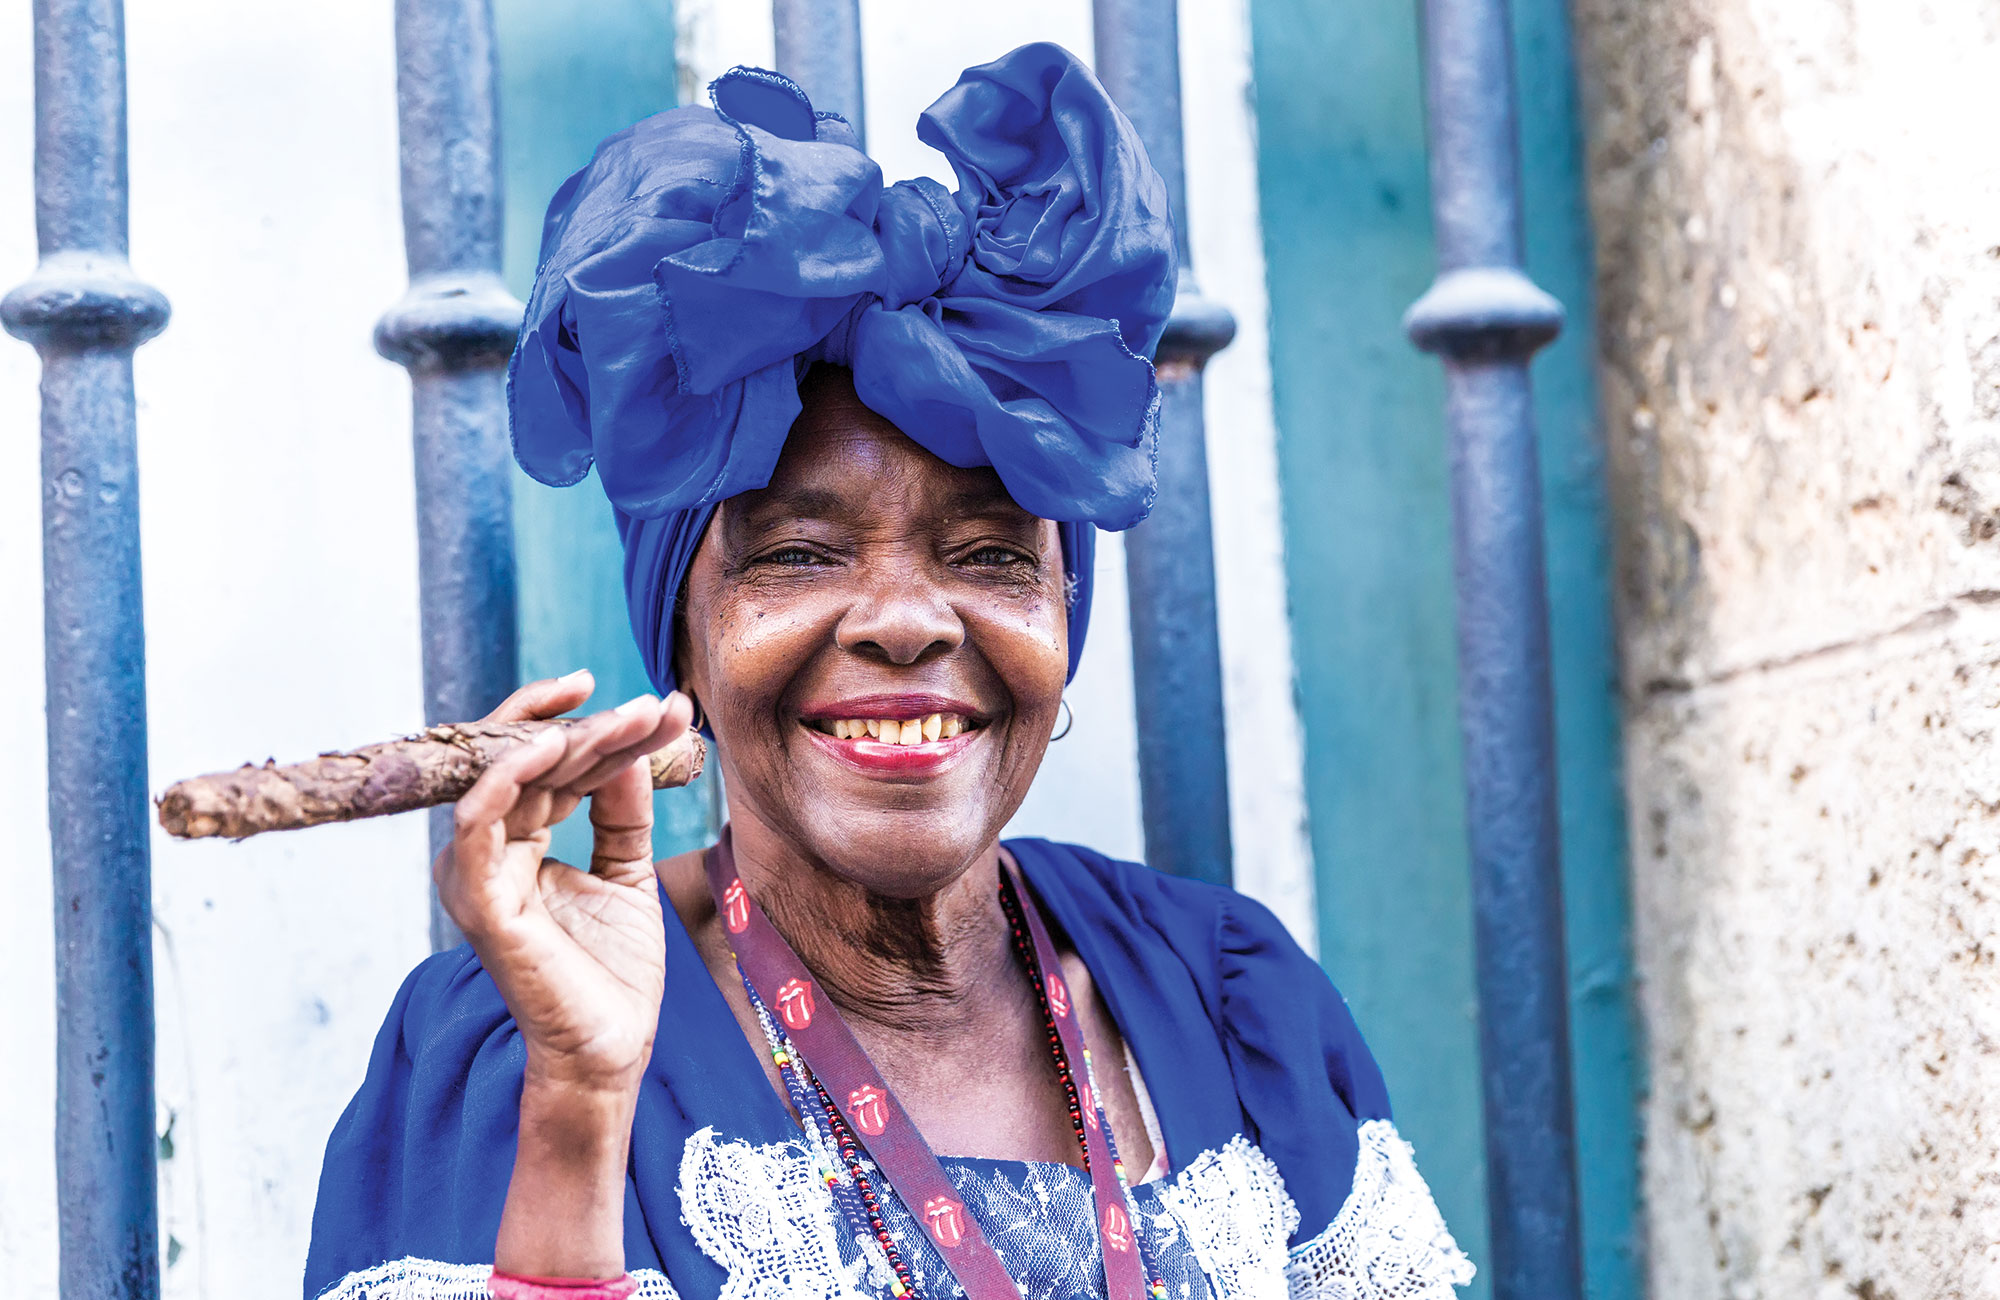 Femme tenant un cigare à La Havane - Cuba